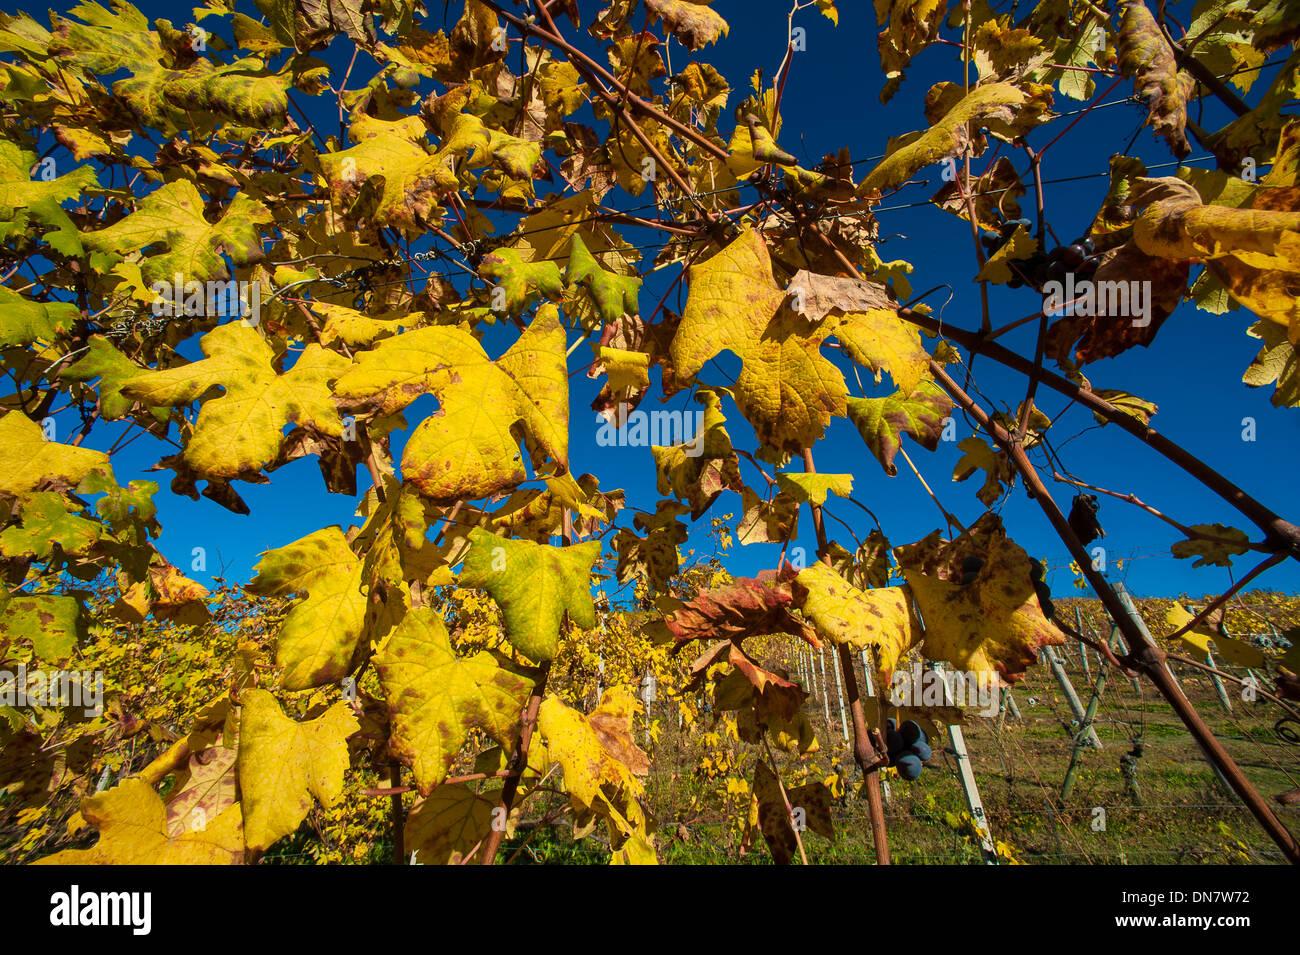 Europe Italy Piedmont langhe vineyards - Stock Image